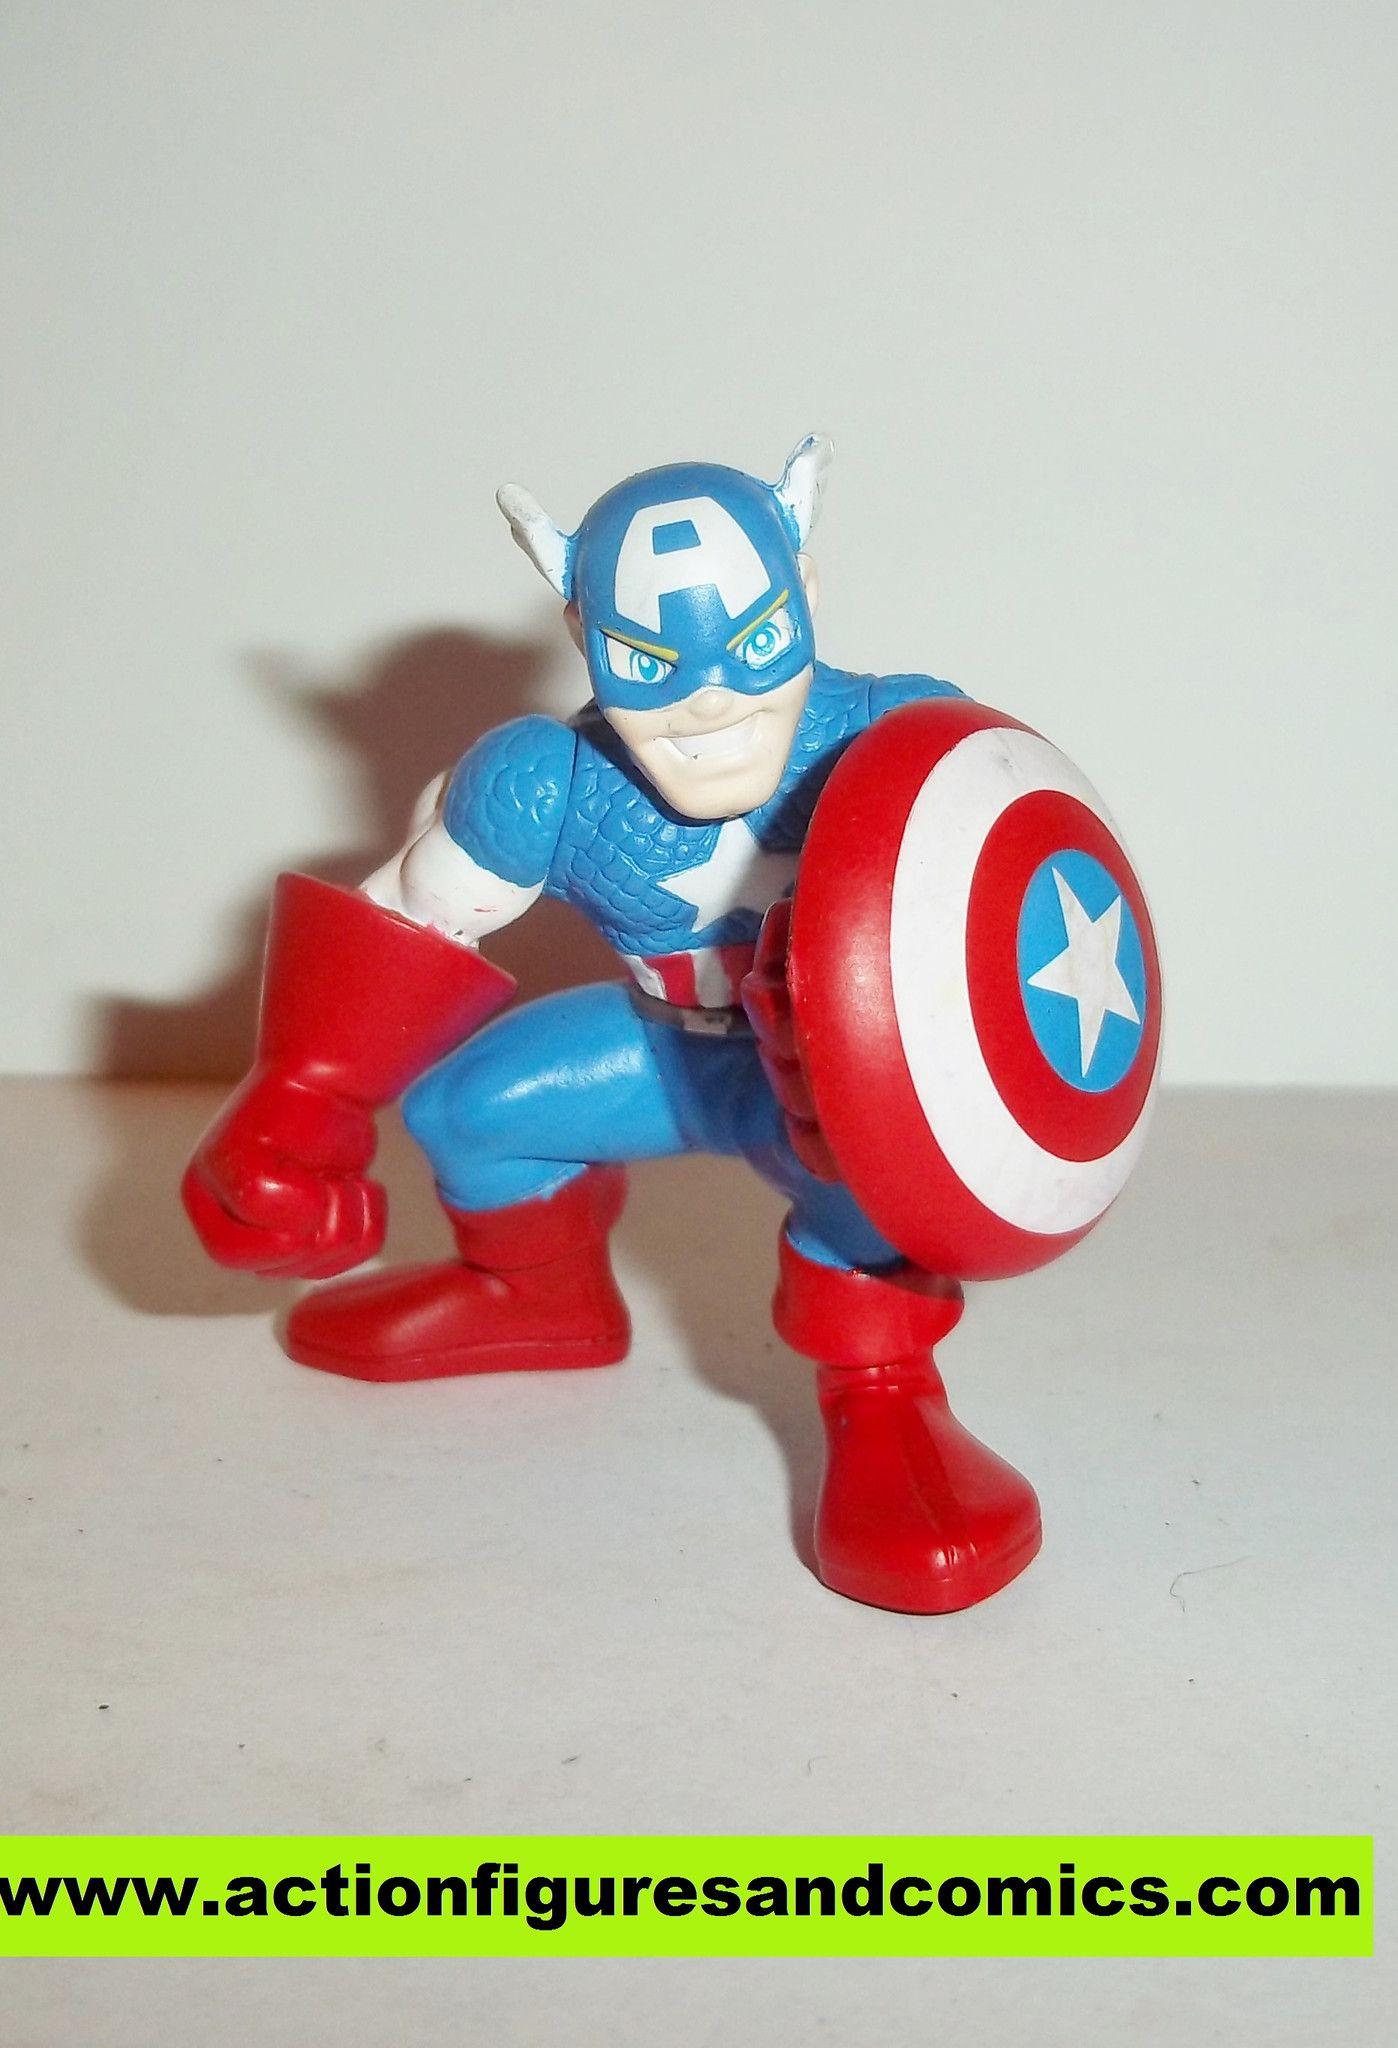 Marvel Super Hero Squad CAPTAIN AMERICA complete holding shield pvc action figures nosh